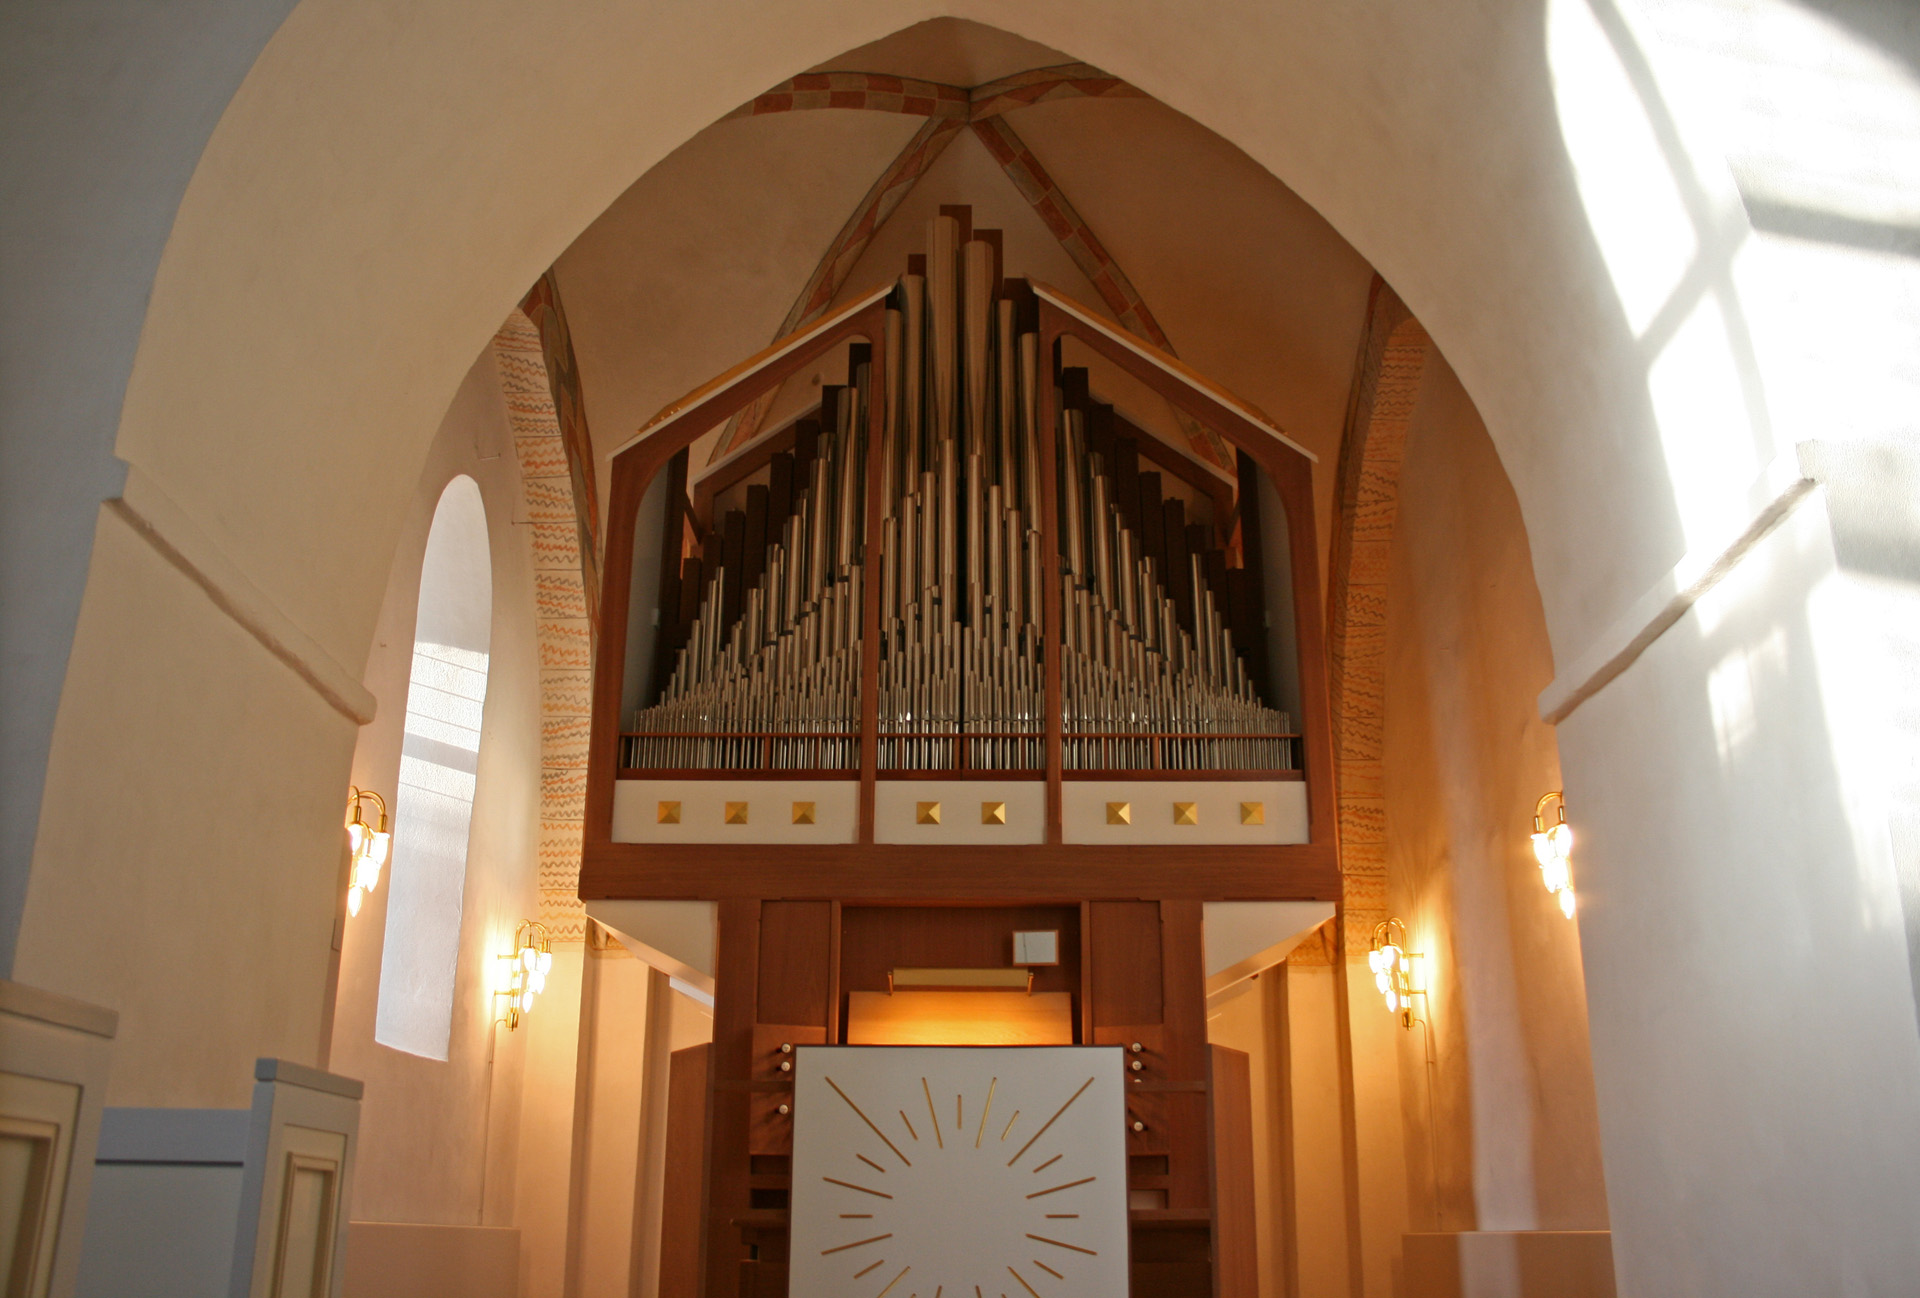 The Pipe Organ in Jørlunde Church